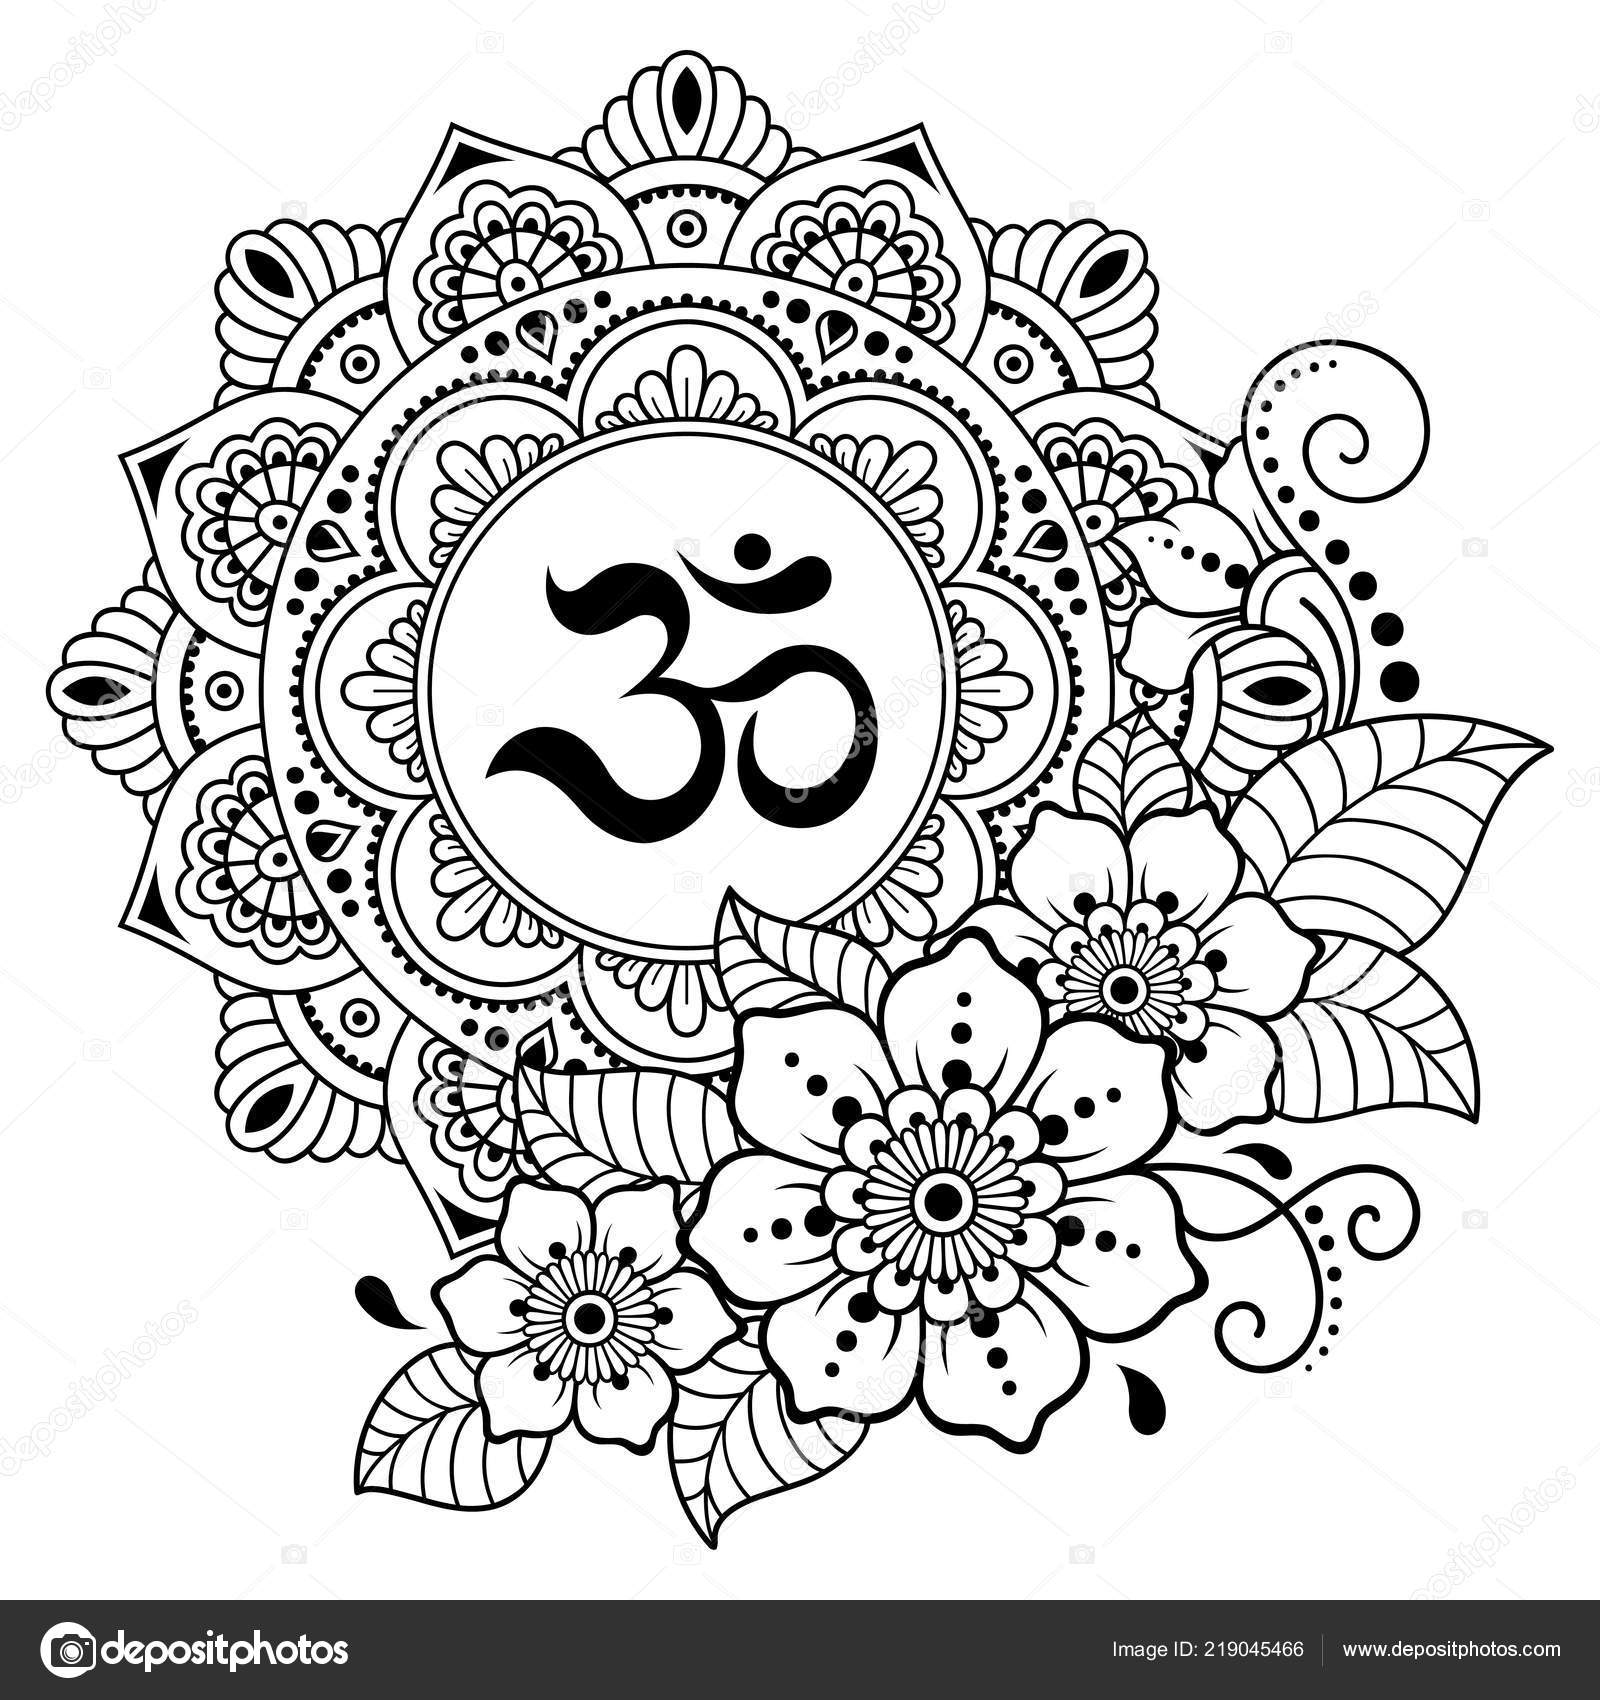 depositphotos stock illustration circular pattern form mandala ancient